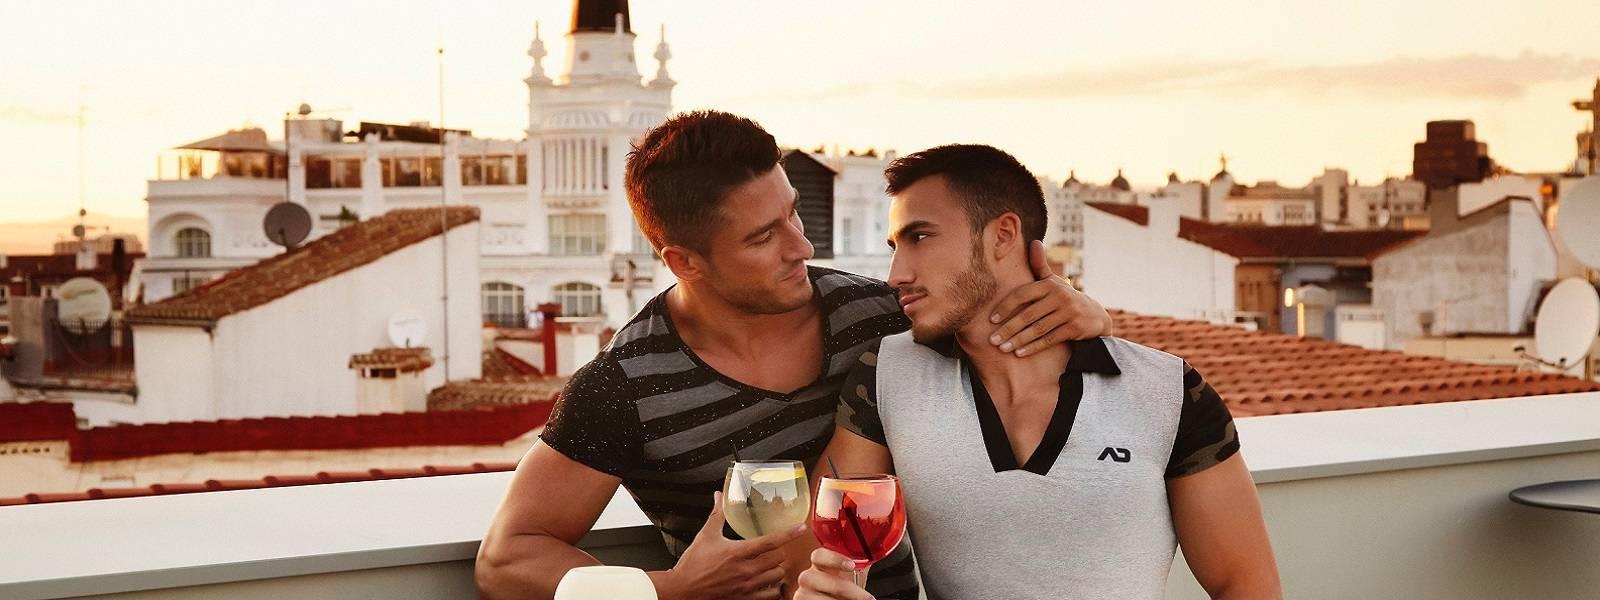 free gay web cam shows